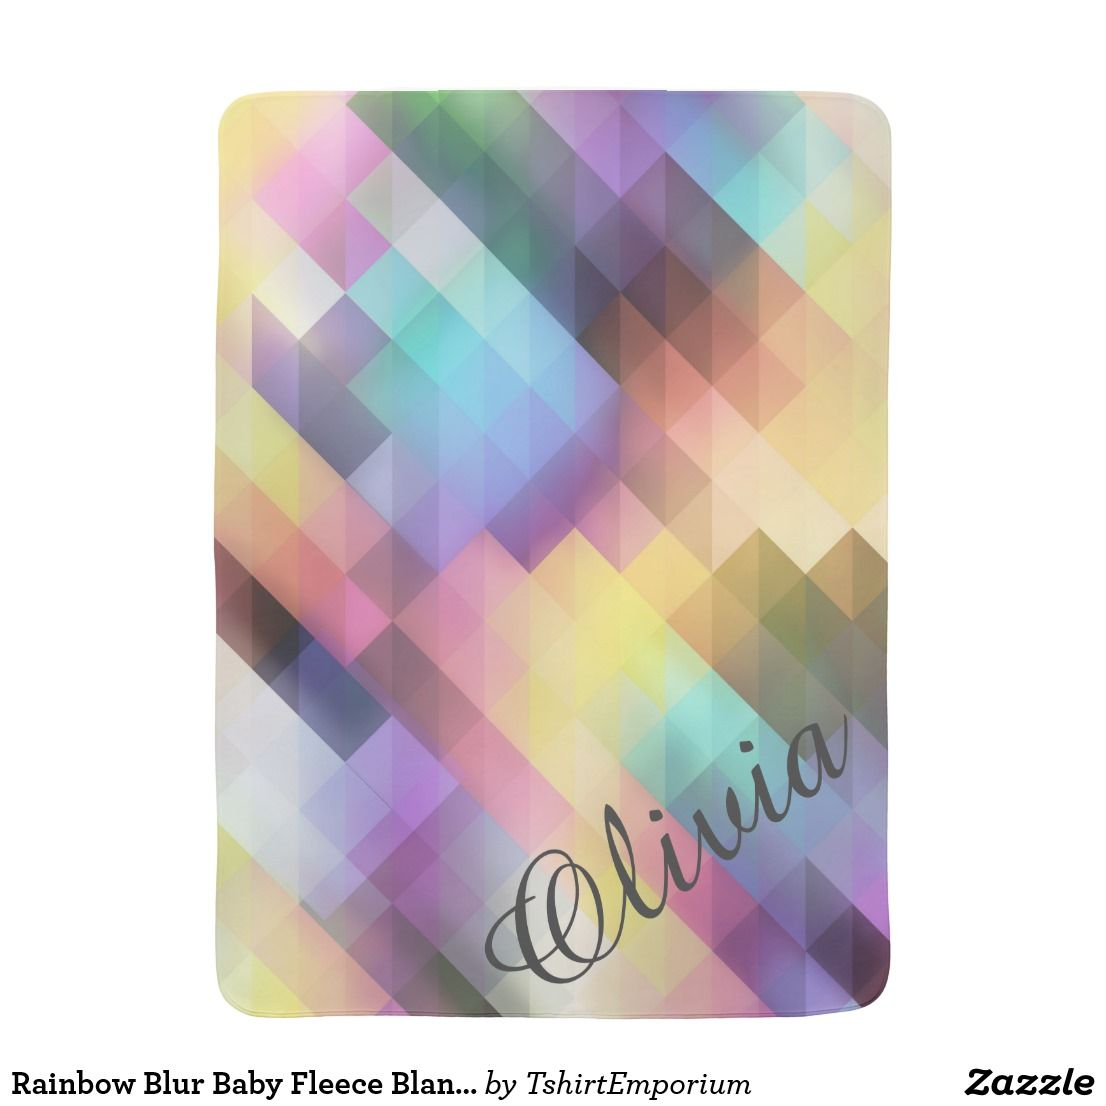 Rainbow Blur Baby Fleece Blanket